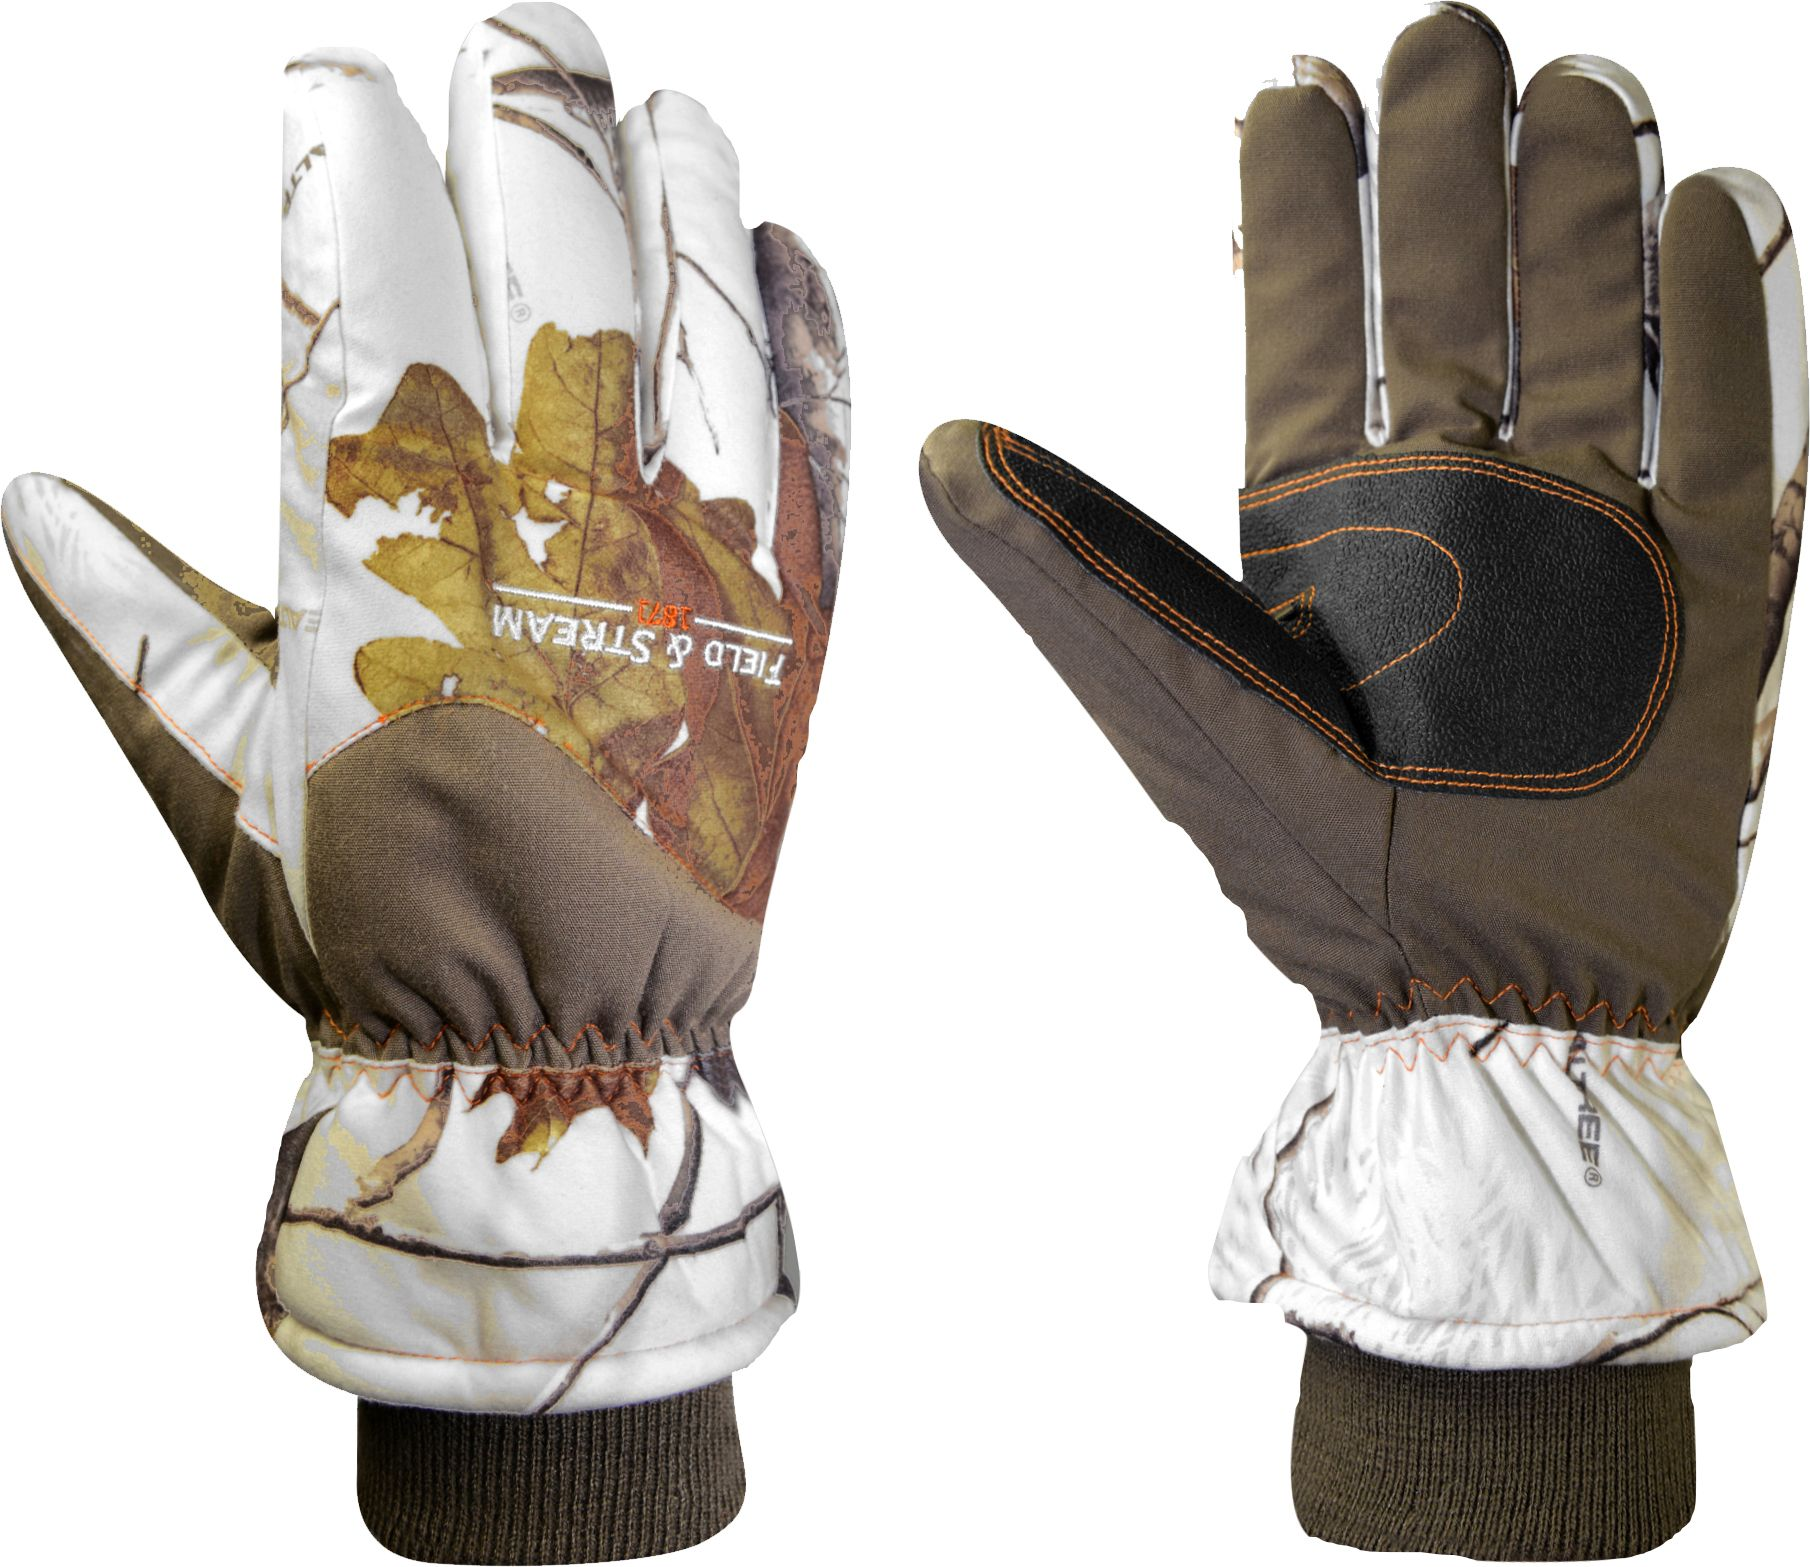 Field & Stream Pursuit Hunting Glove, Men's, Size: Medium, AP Snow